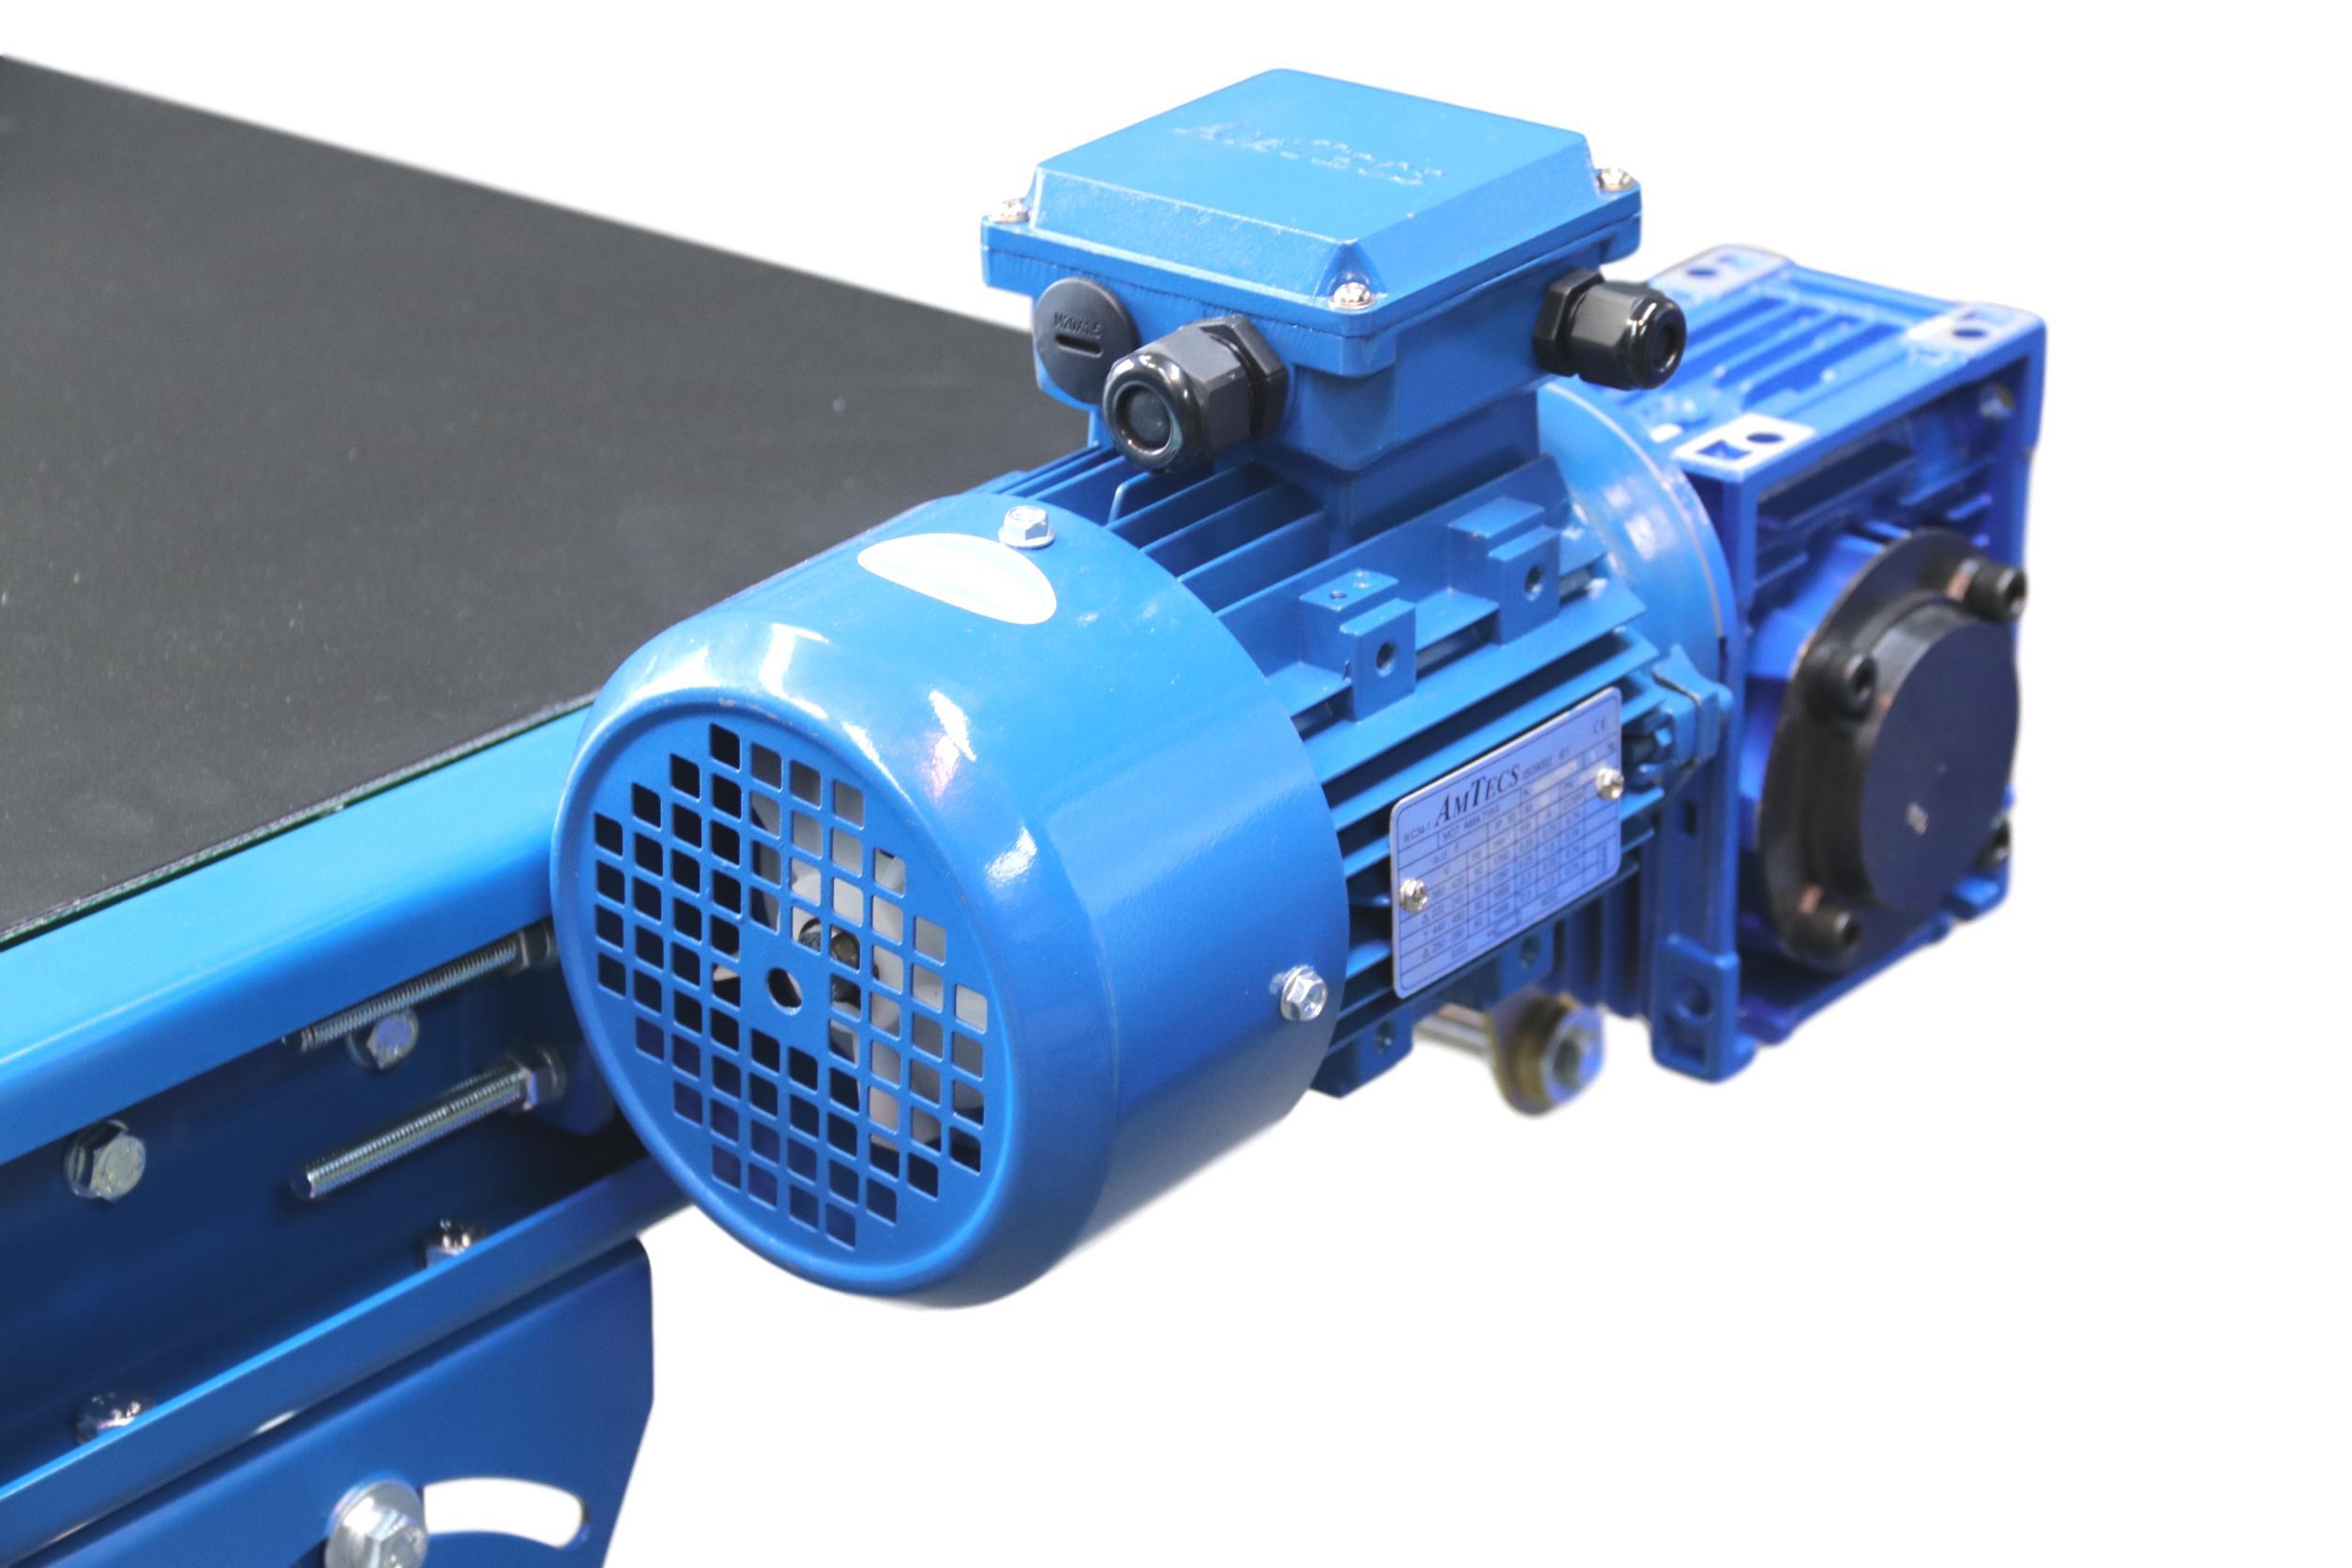 Belt Conveyor with side mounuted motor gear box small belt conveyor slimline conveyors light duty belt conveyors